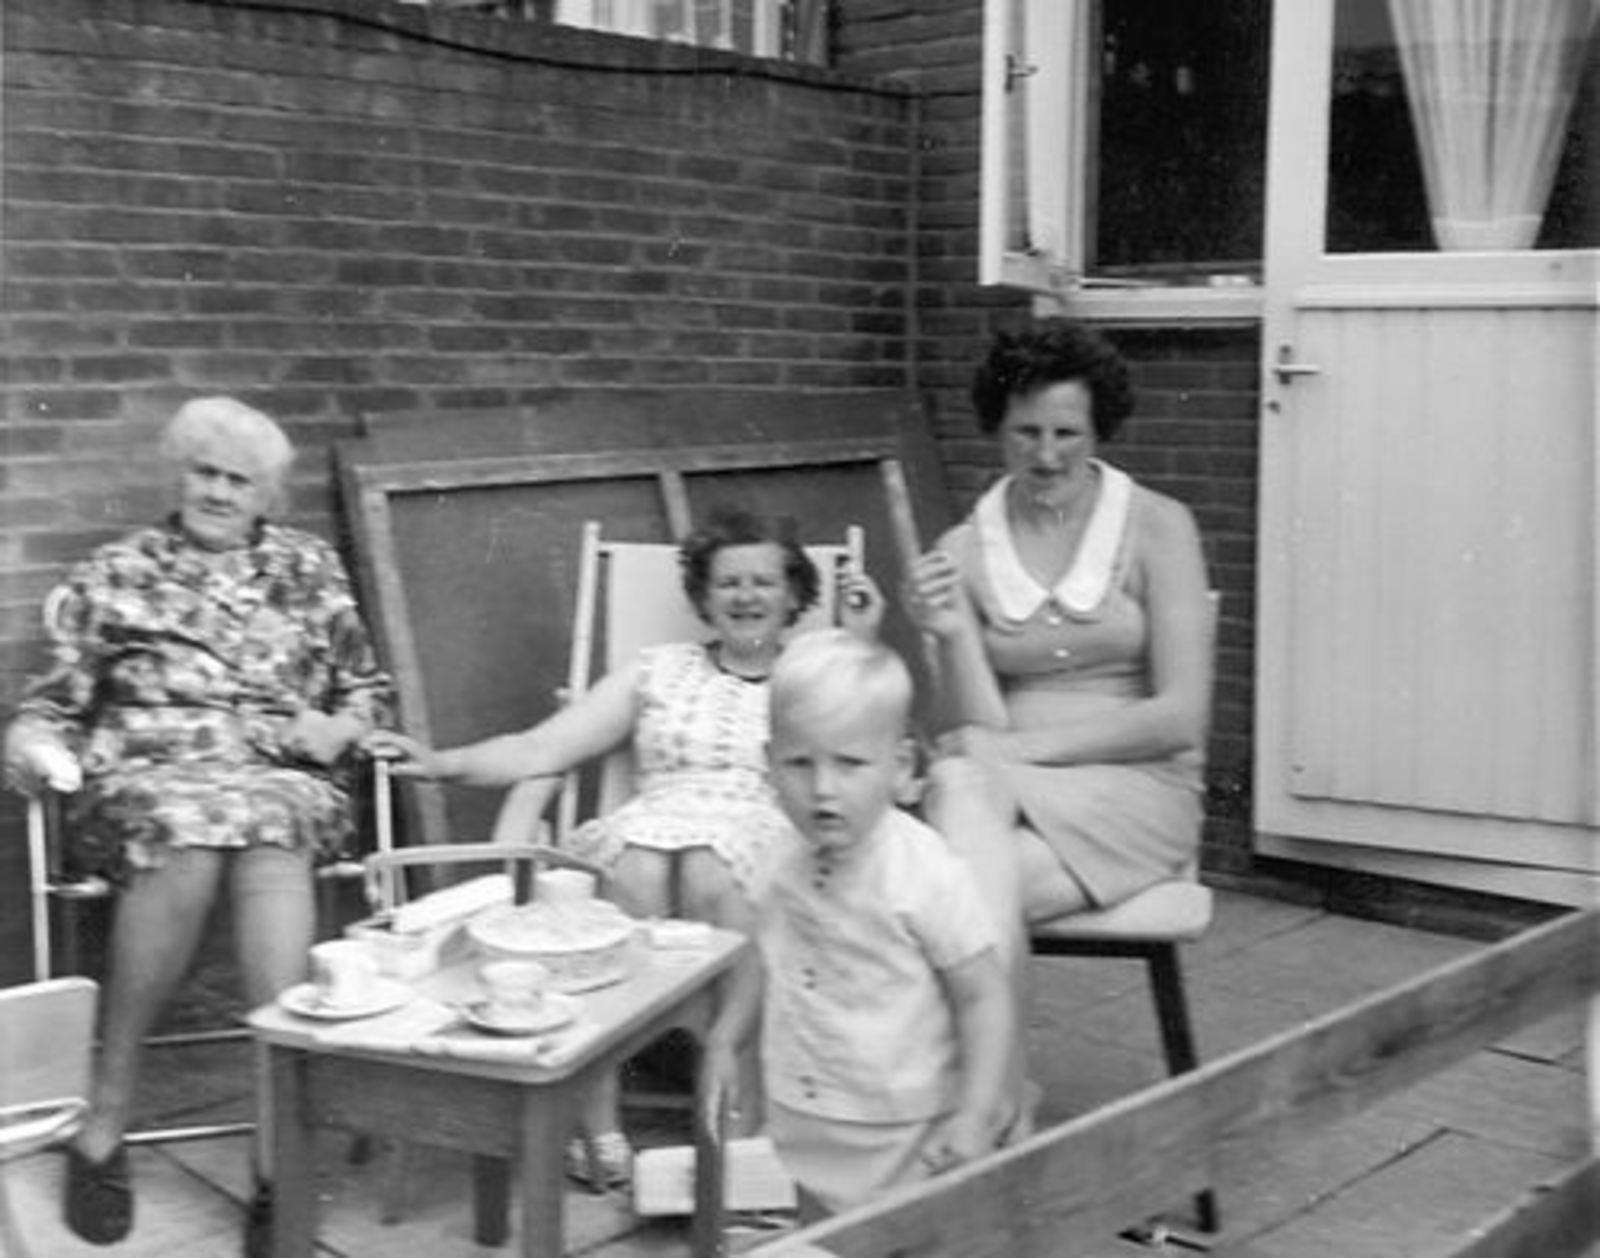 Imanse - Bliek Leentje 1920 19__ met dames Meijer bij Leentje v Veen 02